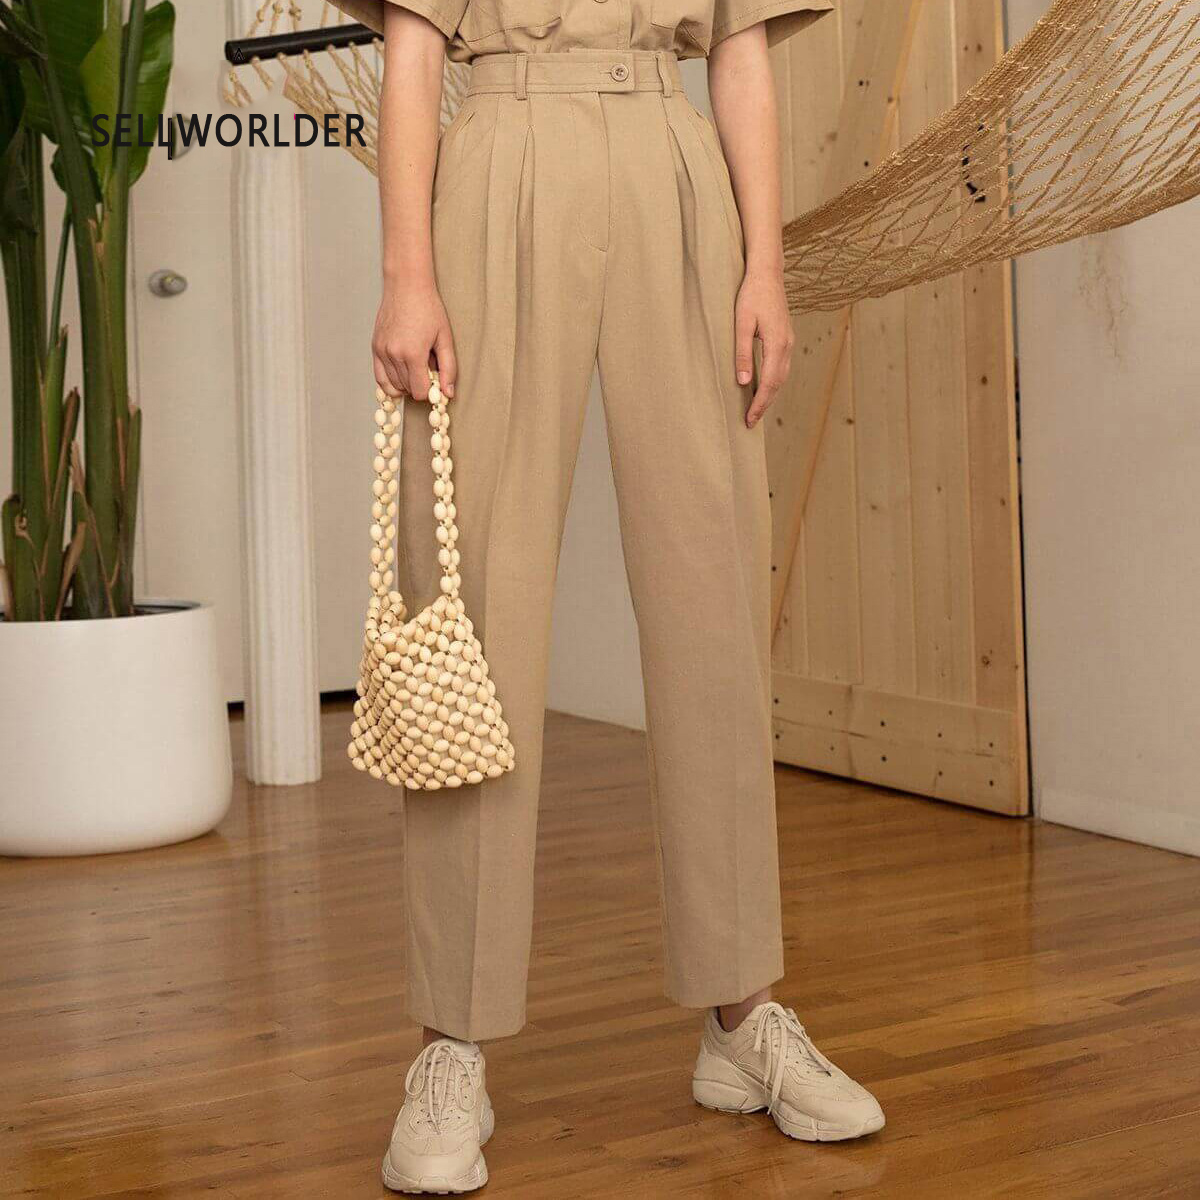 659e5f1401e5 2019 SELLWORLDER nueva moda mujer alta cintura monocromática Safari estilo  pantalones inteligentes